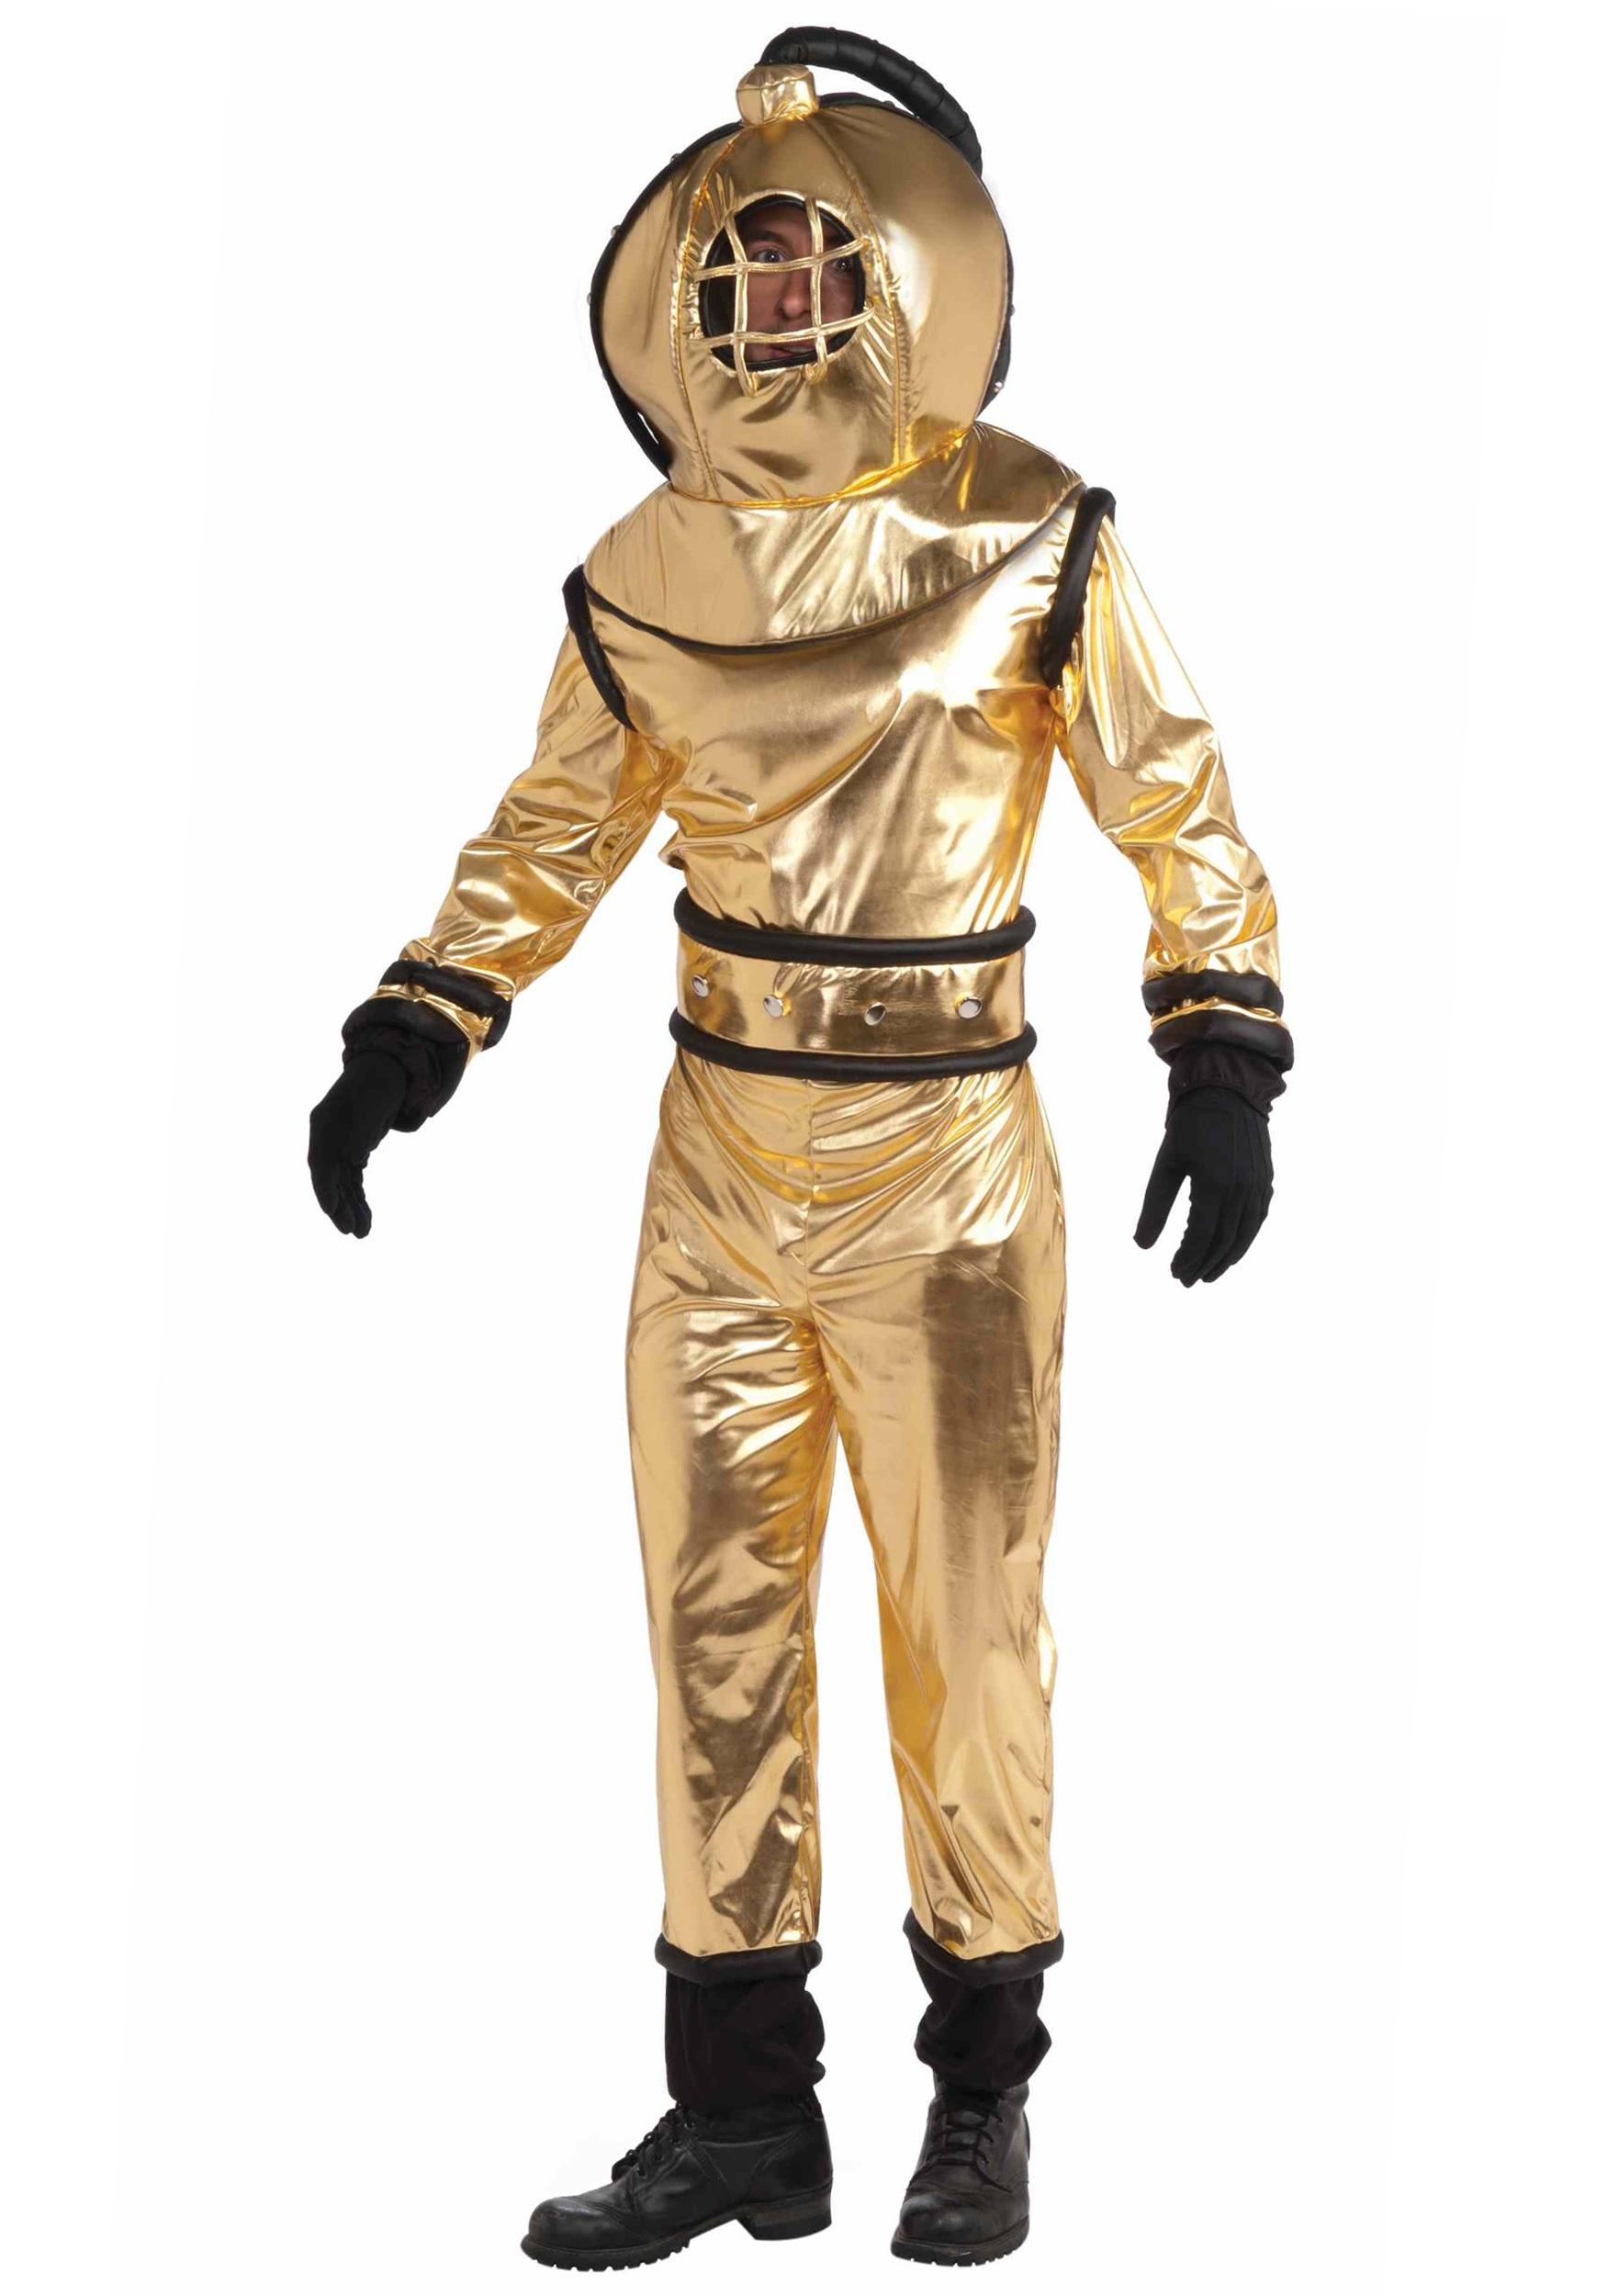 Vintage Deep Sea Diving Suit.